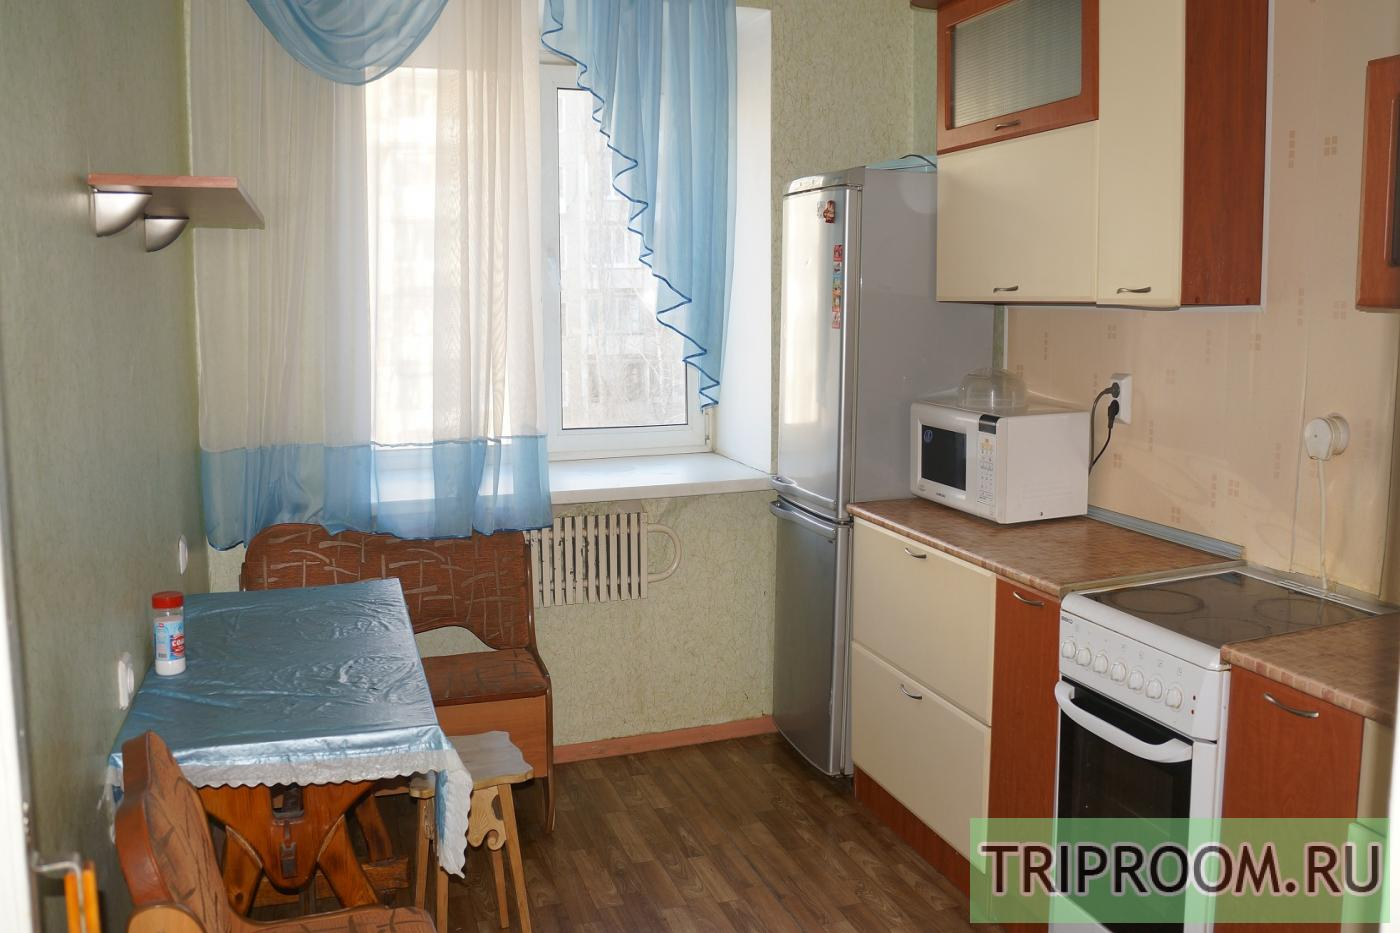 2-комнатная квартира посуточно (вариант № 4713), ул. Хользунова улица, фото № 2